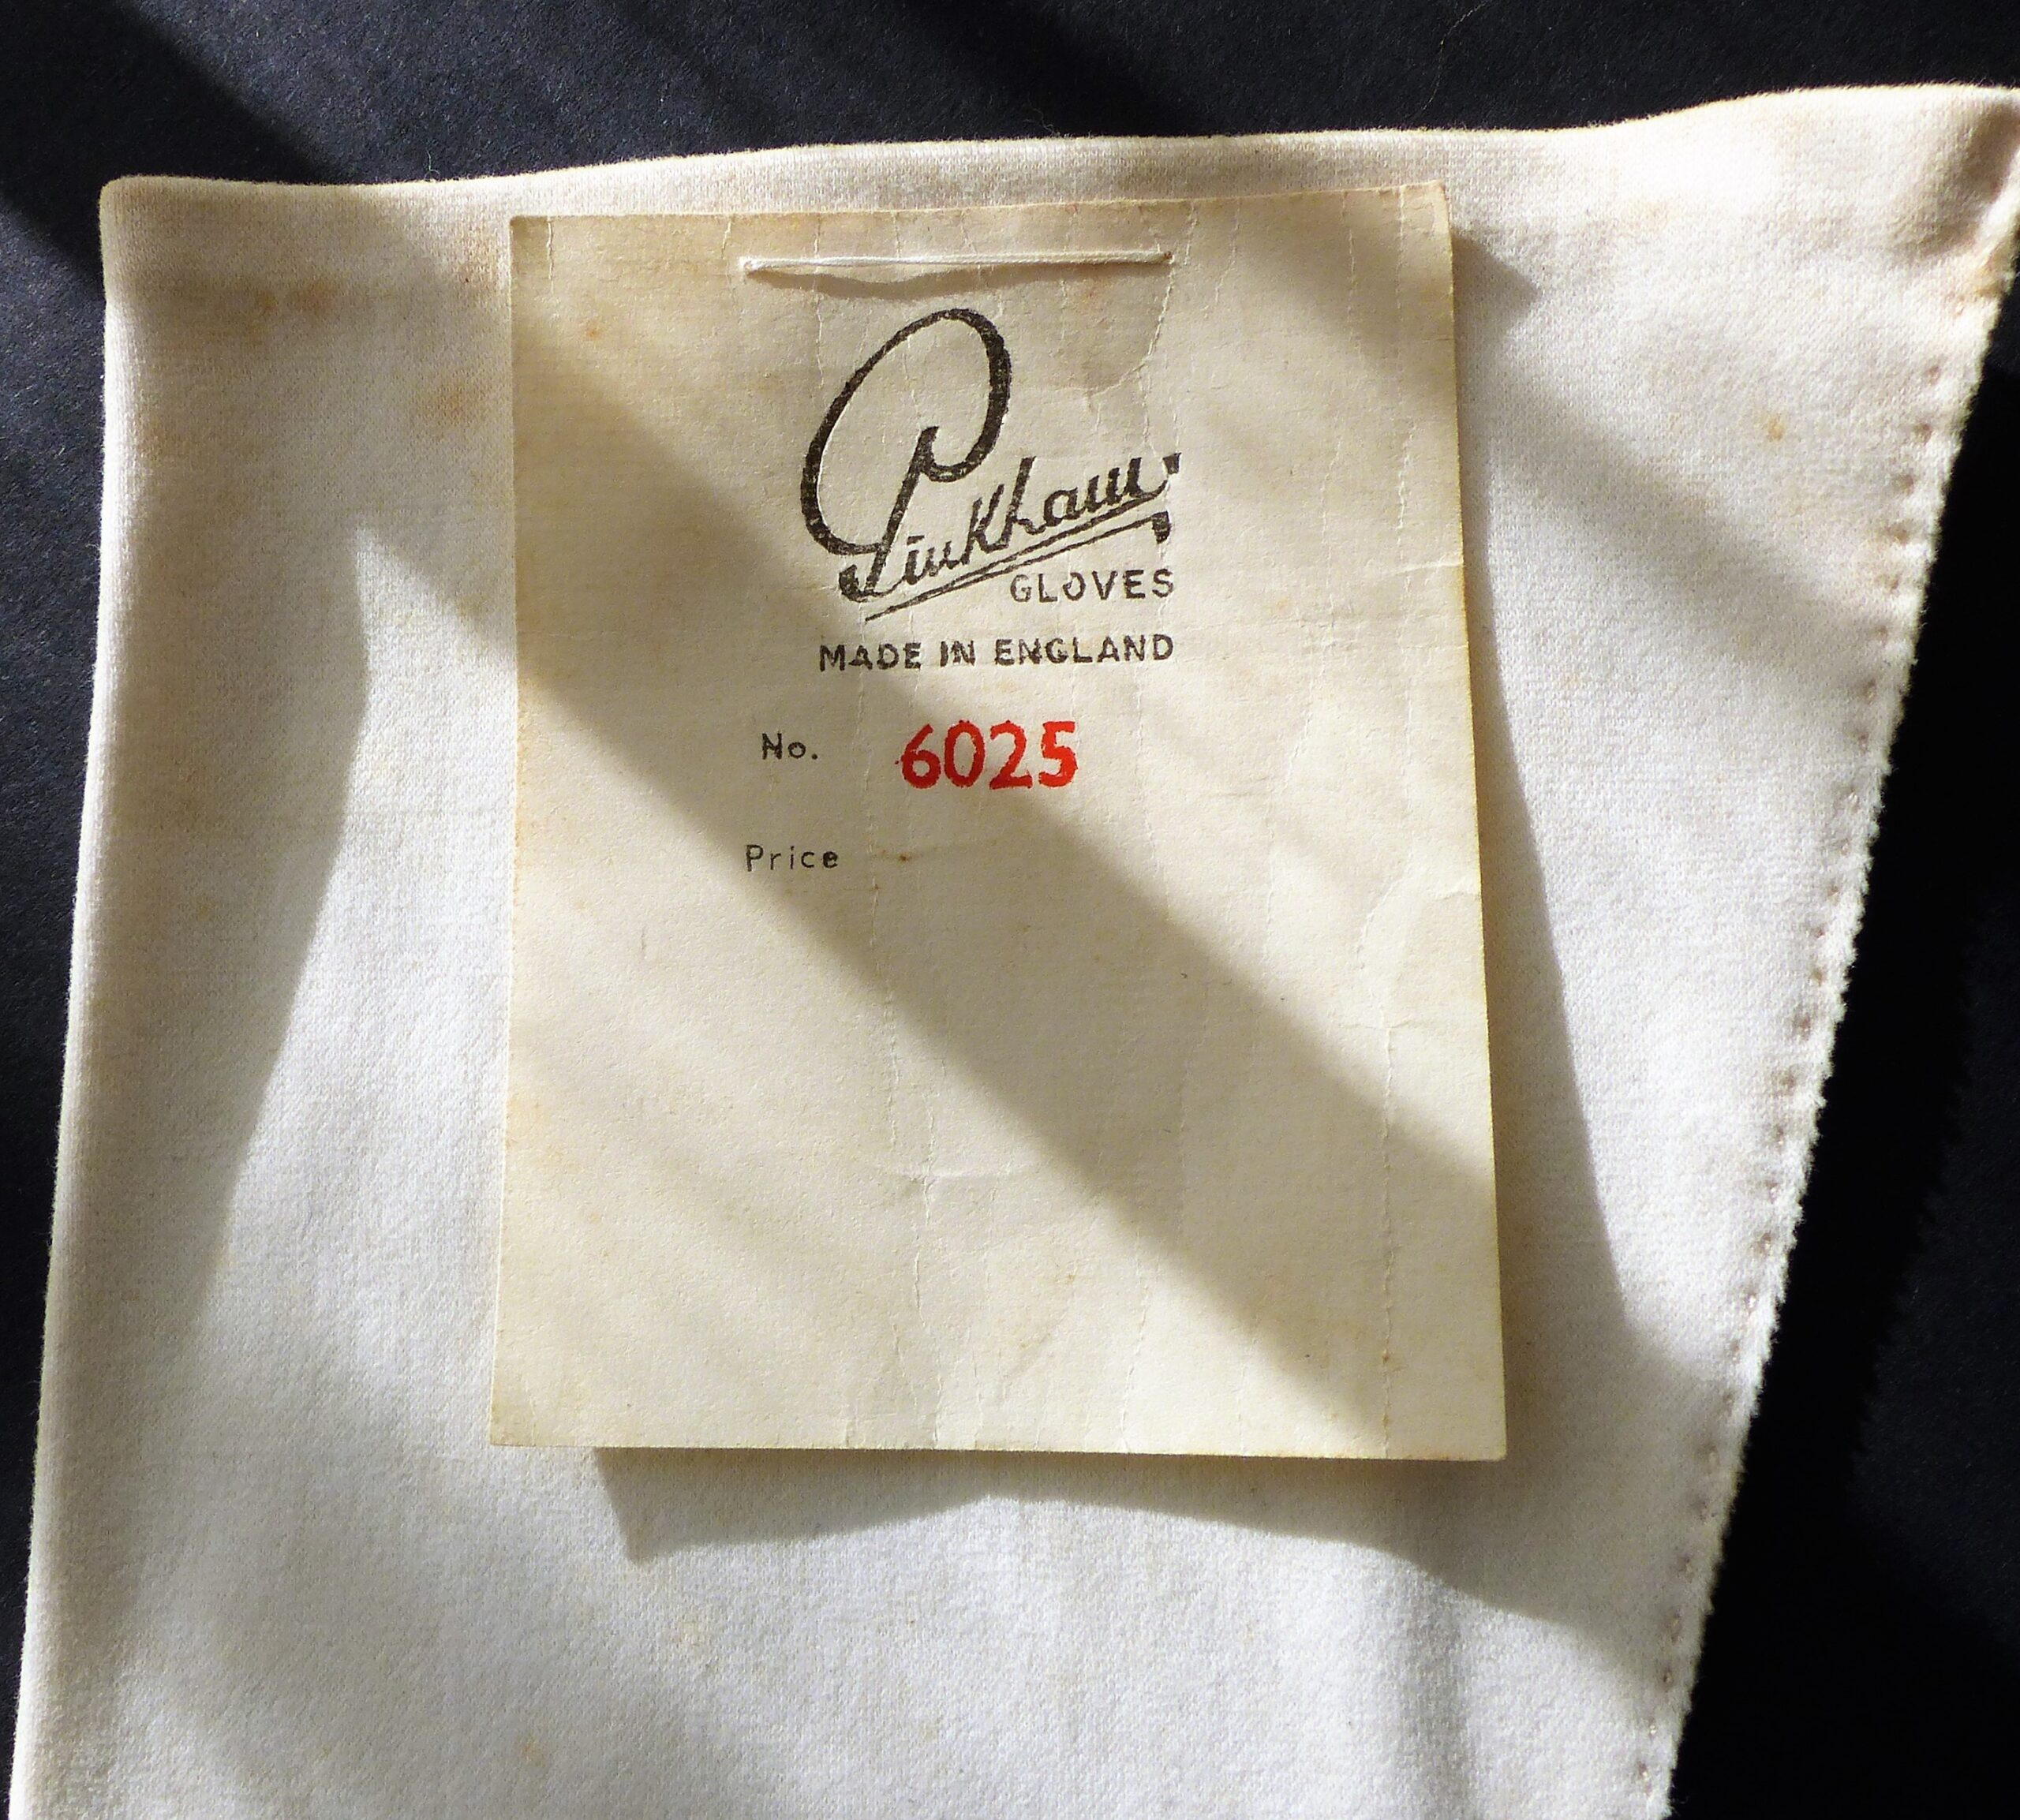 9085 label